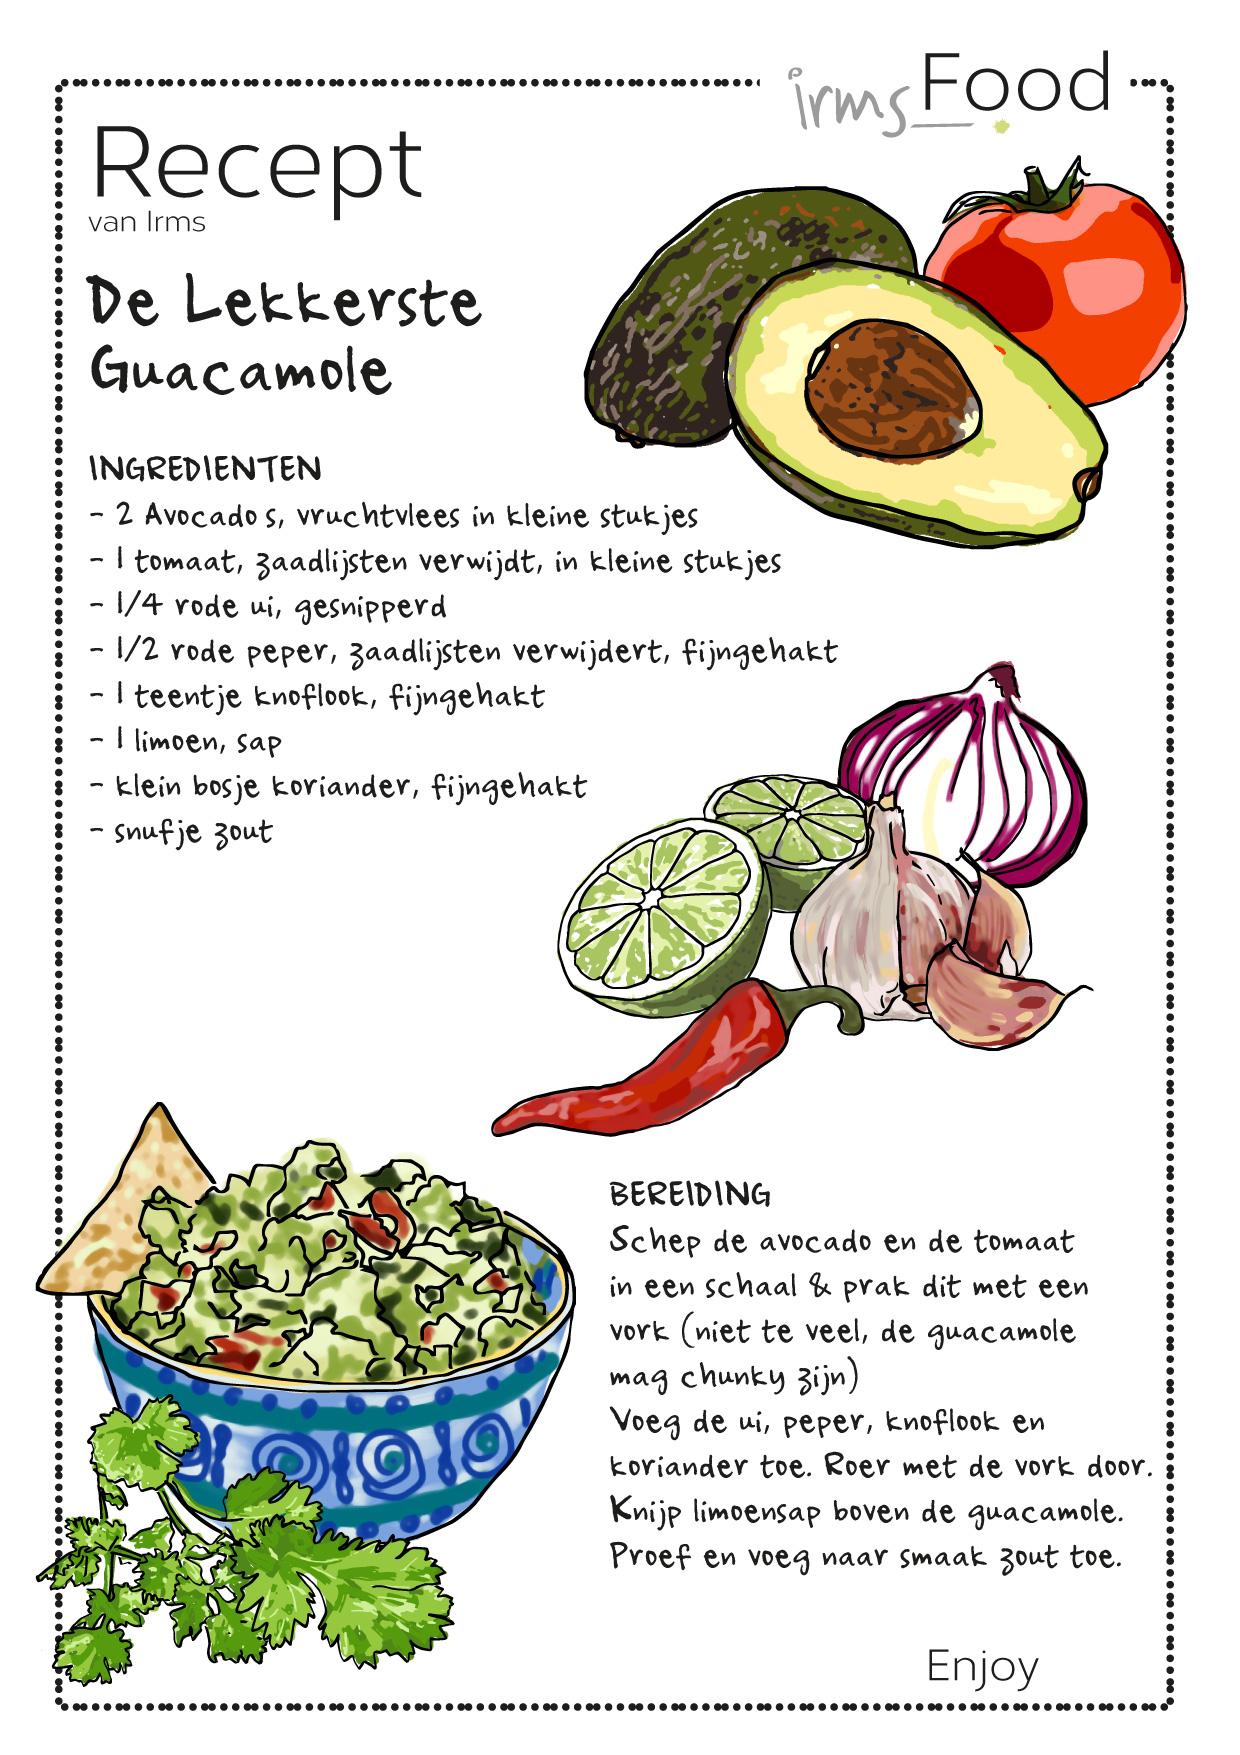 guacamole-illustratie-recept-irmsblog